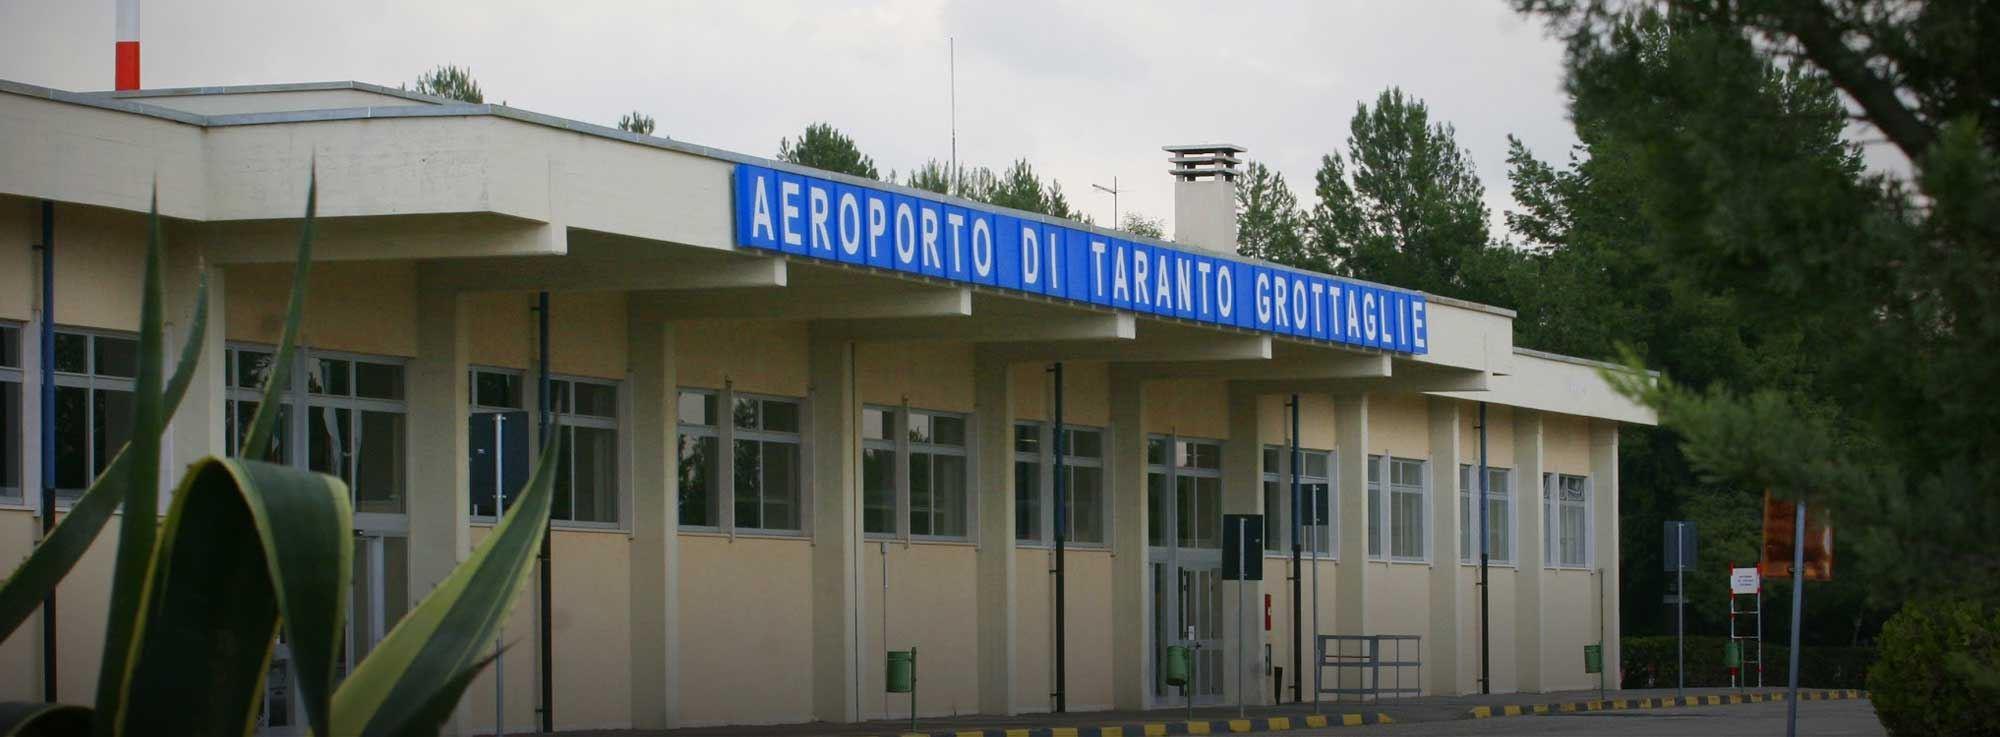 Aeroporto Brindisi : Brindisi berlino nuovo volo easyjet